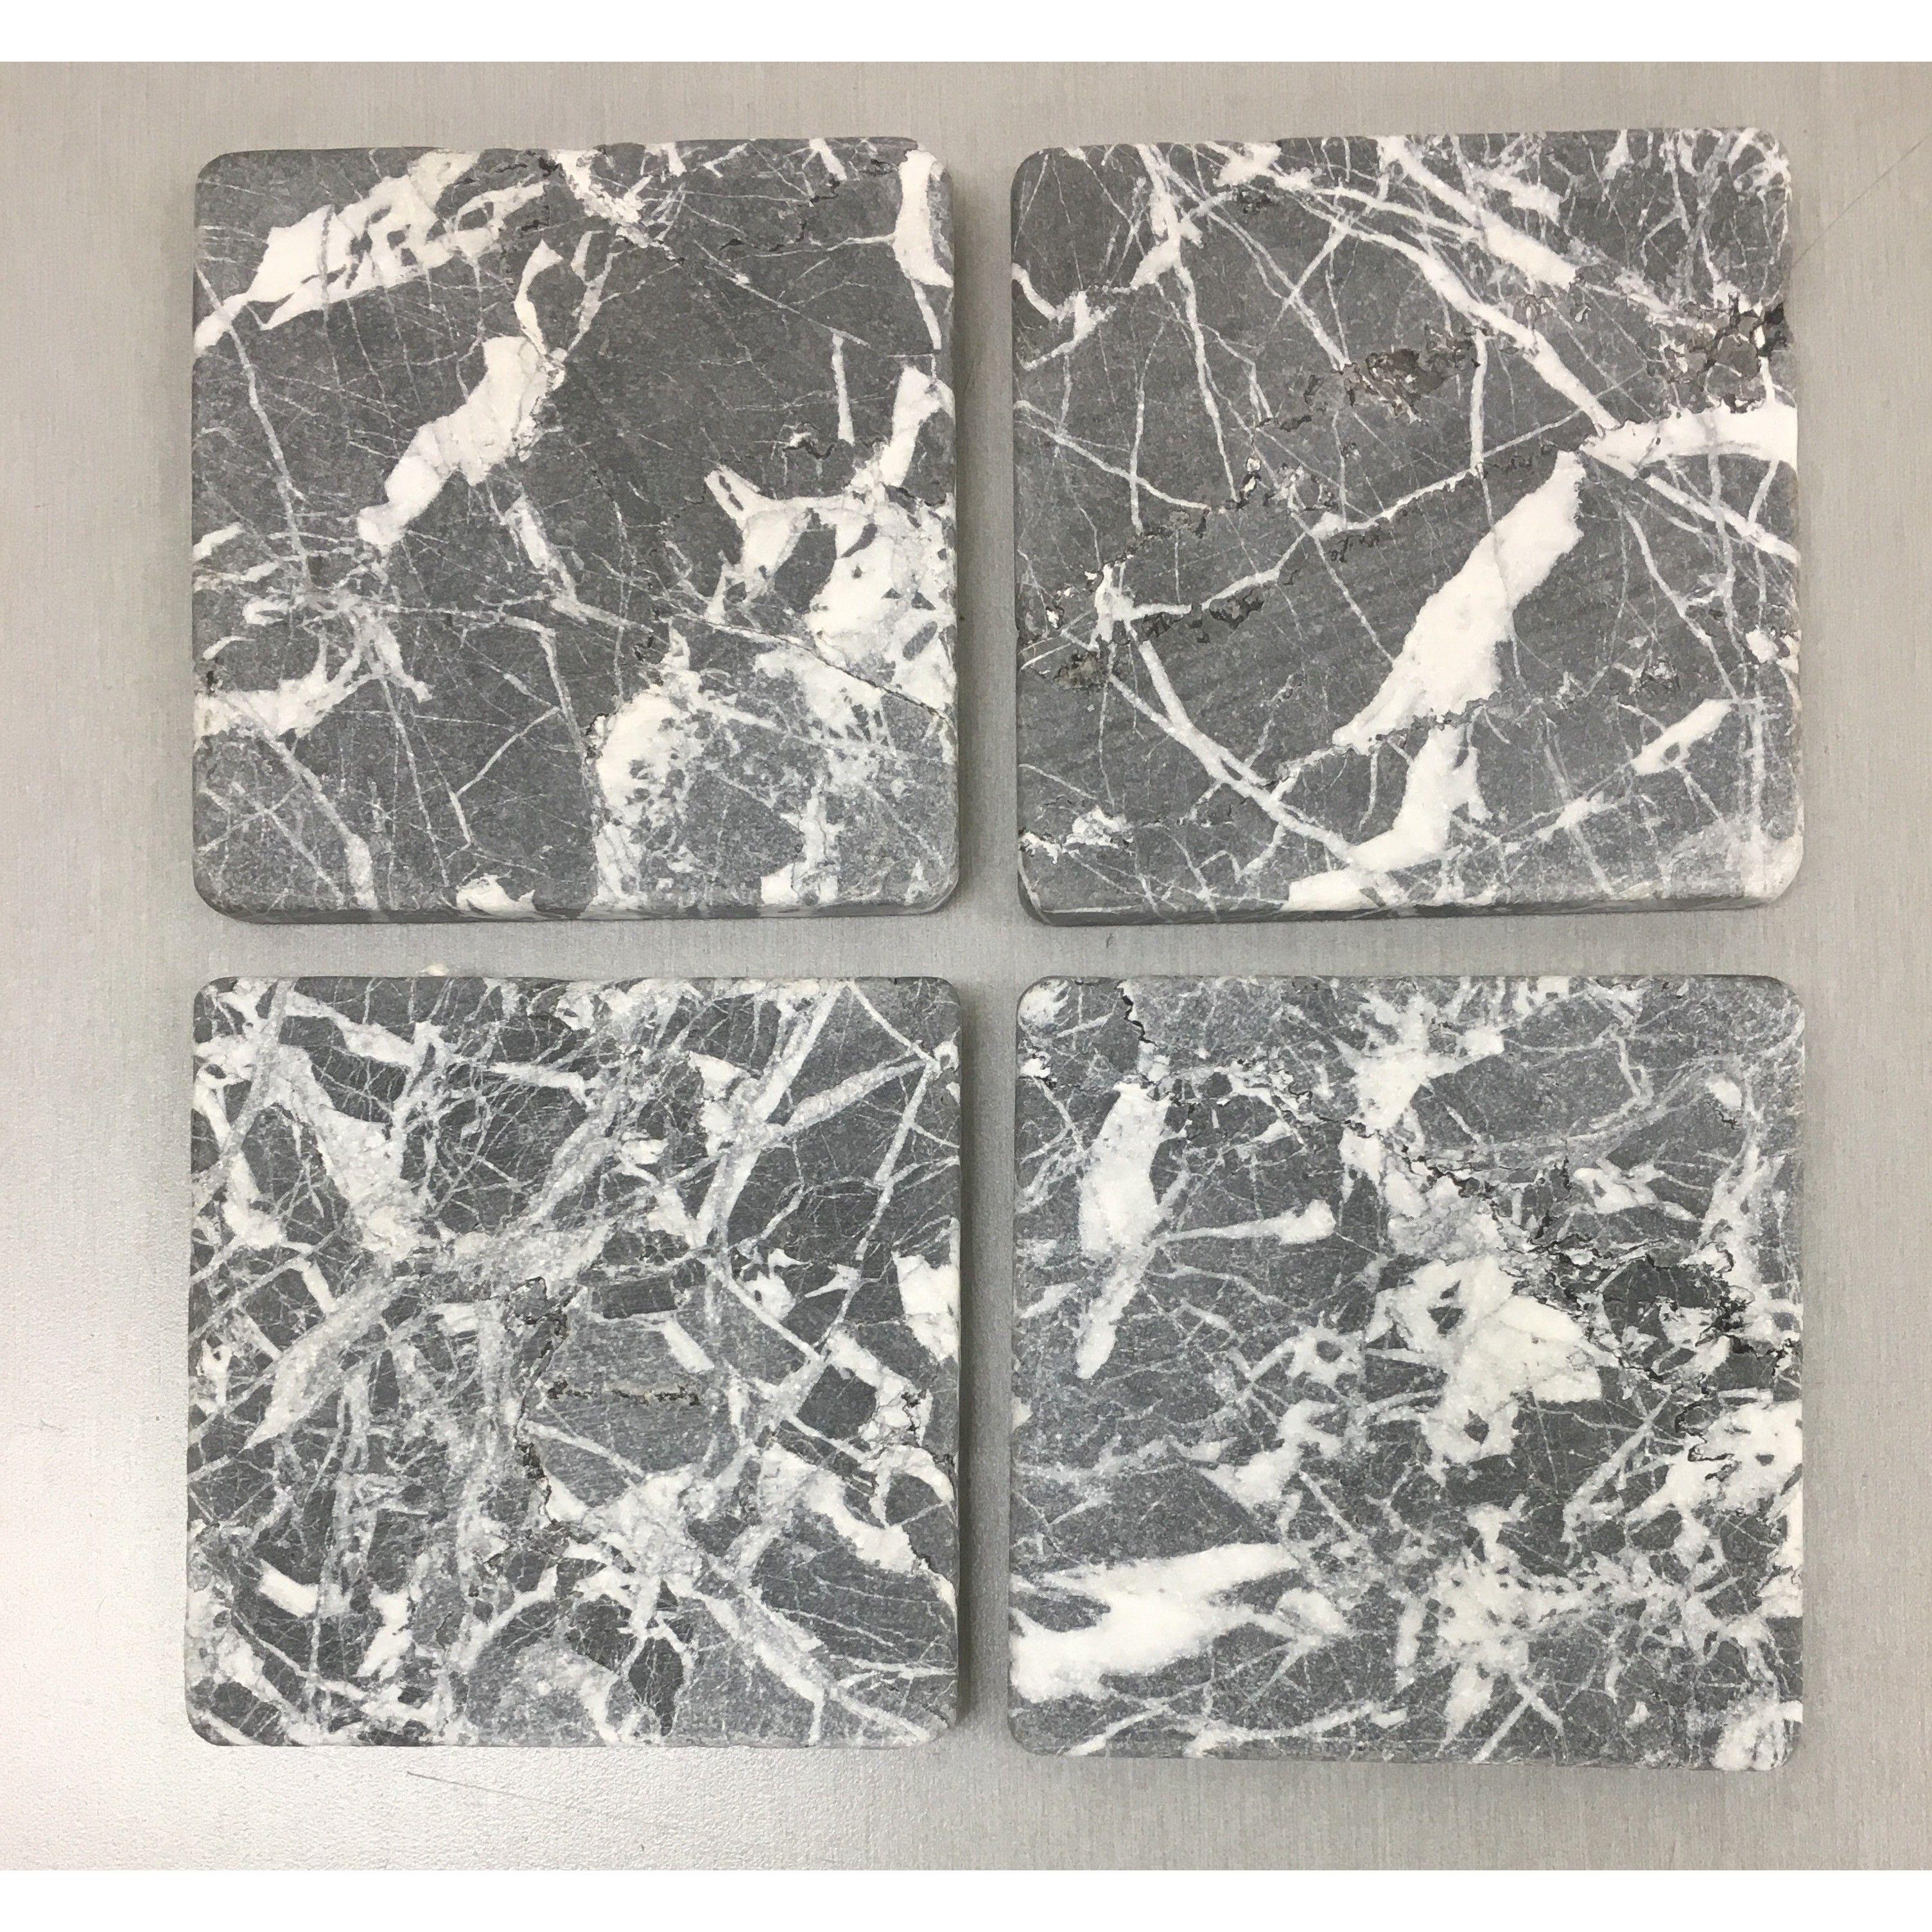 eastern nero tumbled 4x4 marble tile